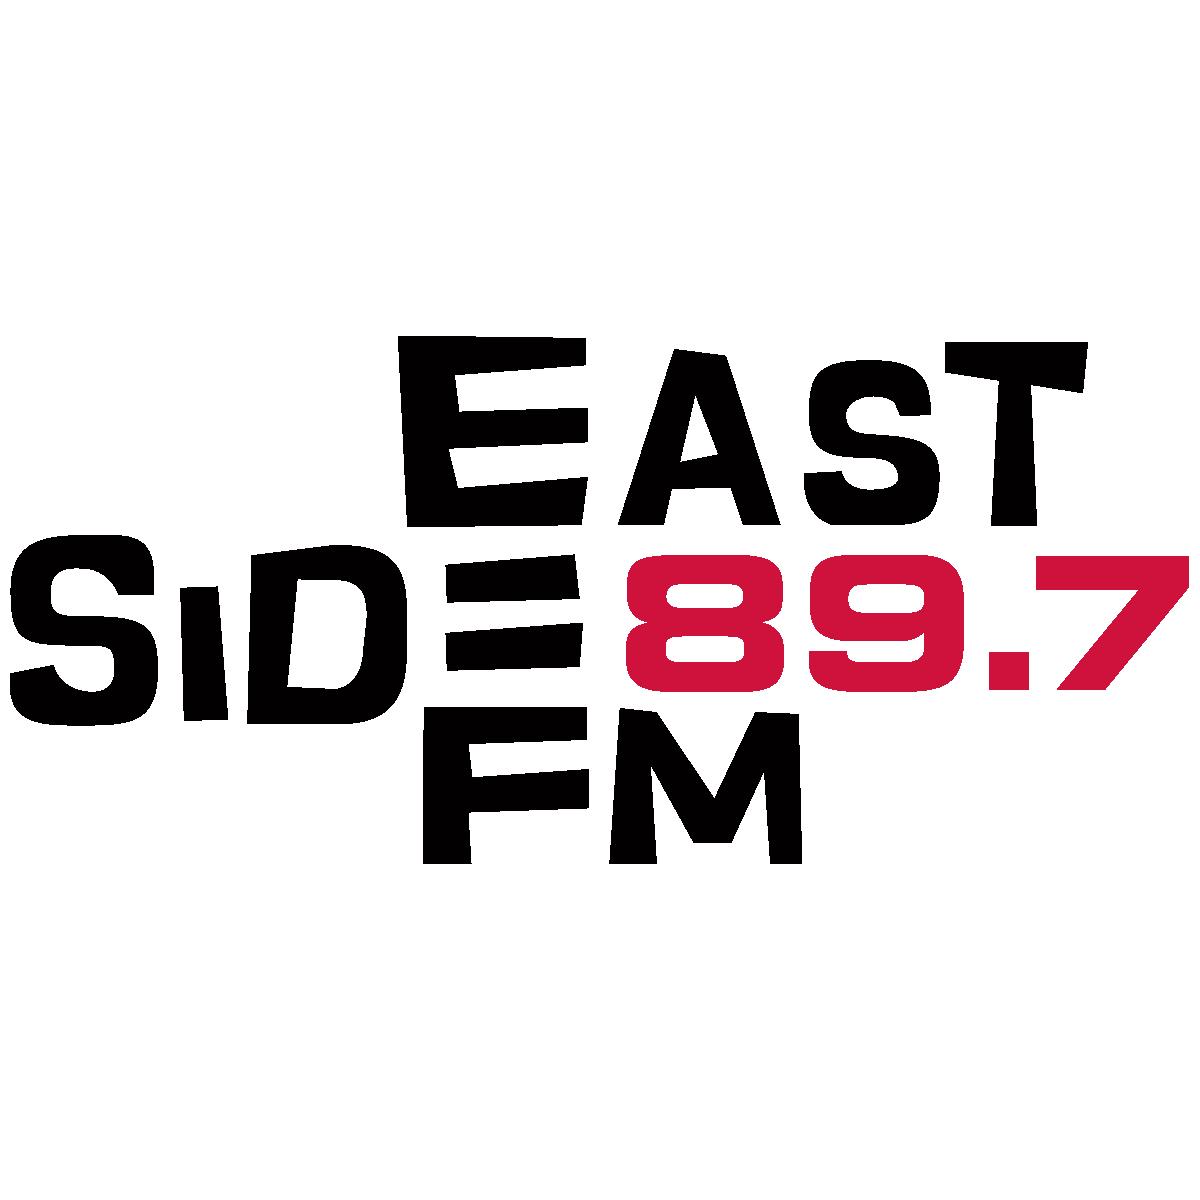 Whales | Tohorā - Image